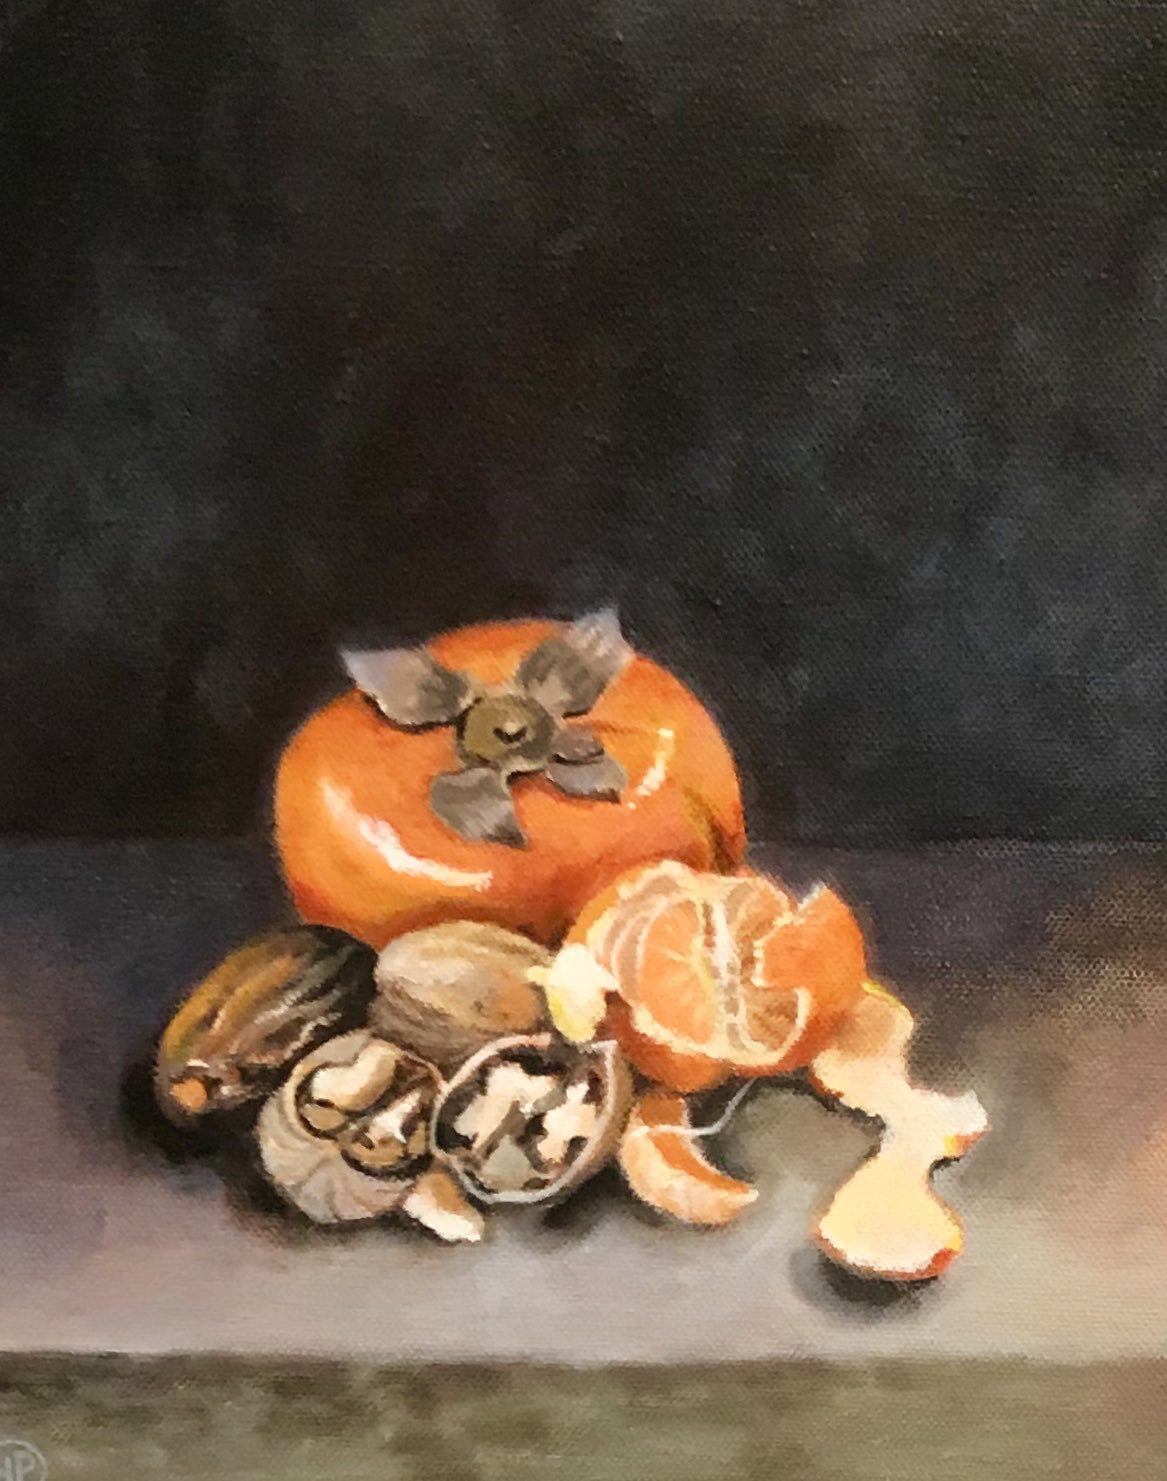 "<span class=""link fancybox-details-link""><a href=""/artists/34-joyce-pinch/works/2966-joyce-pinch-christmas-fruits/"">View Detail Page</a></span><div class=""artist""><strong>Joyce Pinch</strong></div> <div class=""title""><em>Christmas Fruits</em></div> <div class=""medium"">Acrylic on Canvas </div> <div class=""dimensions"">30 x 24 cm </div><div class=""copyright_line"">Copyright The Artist</div>"